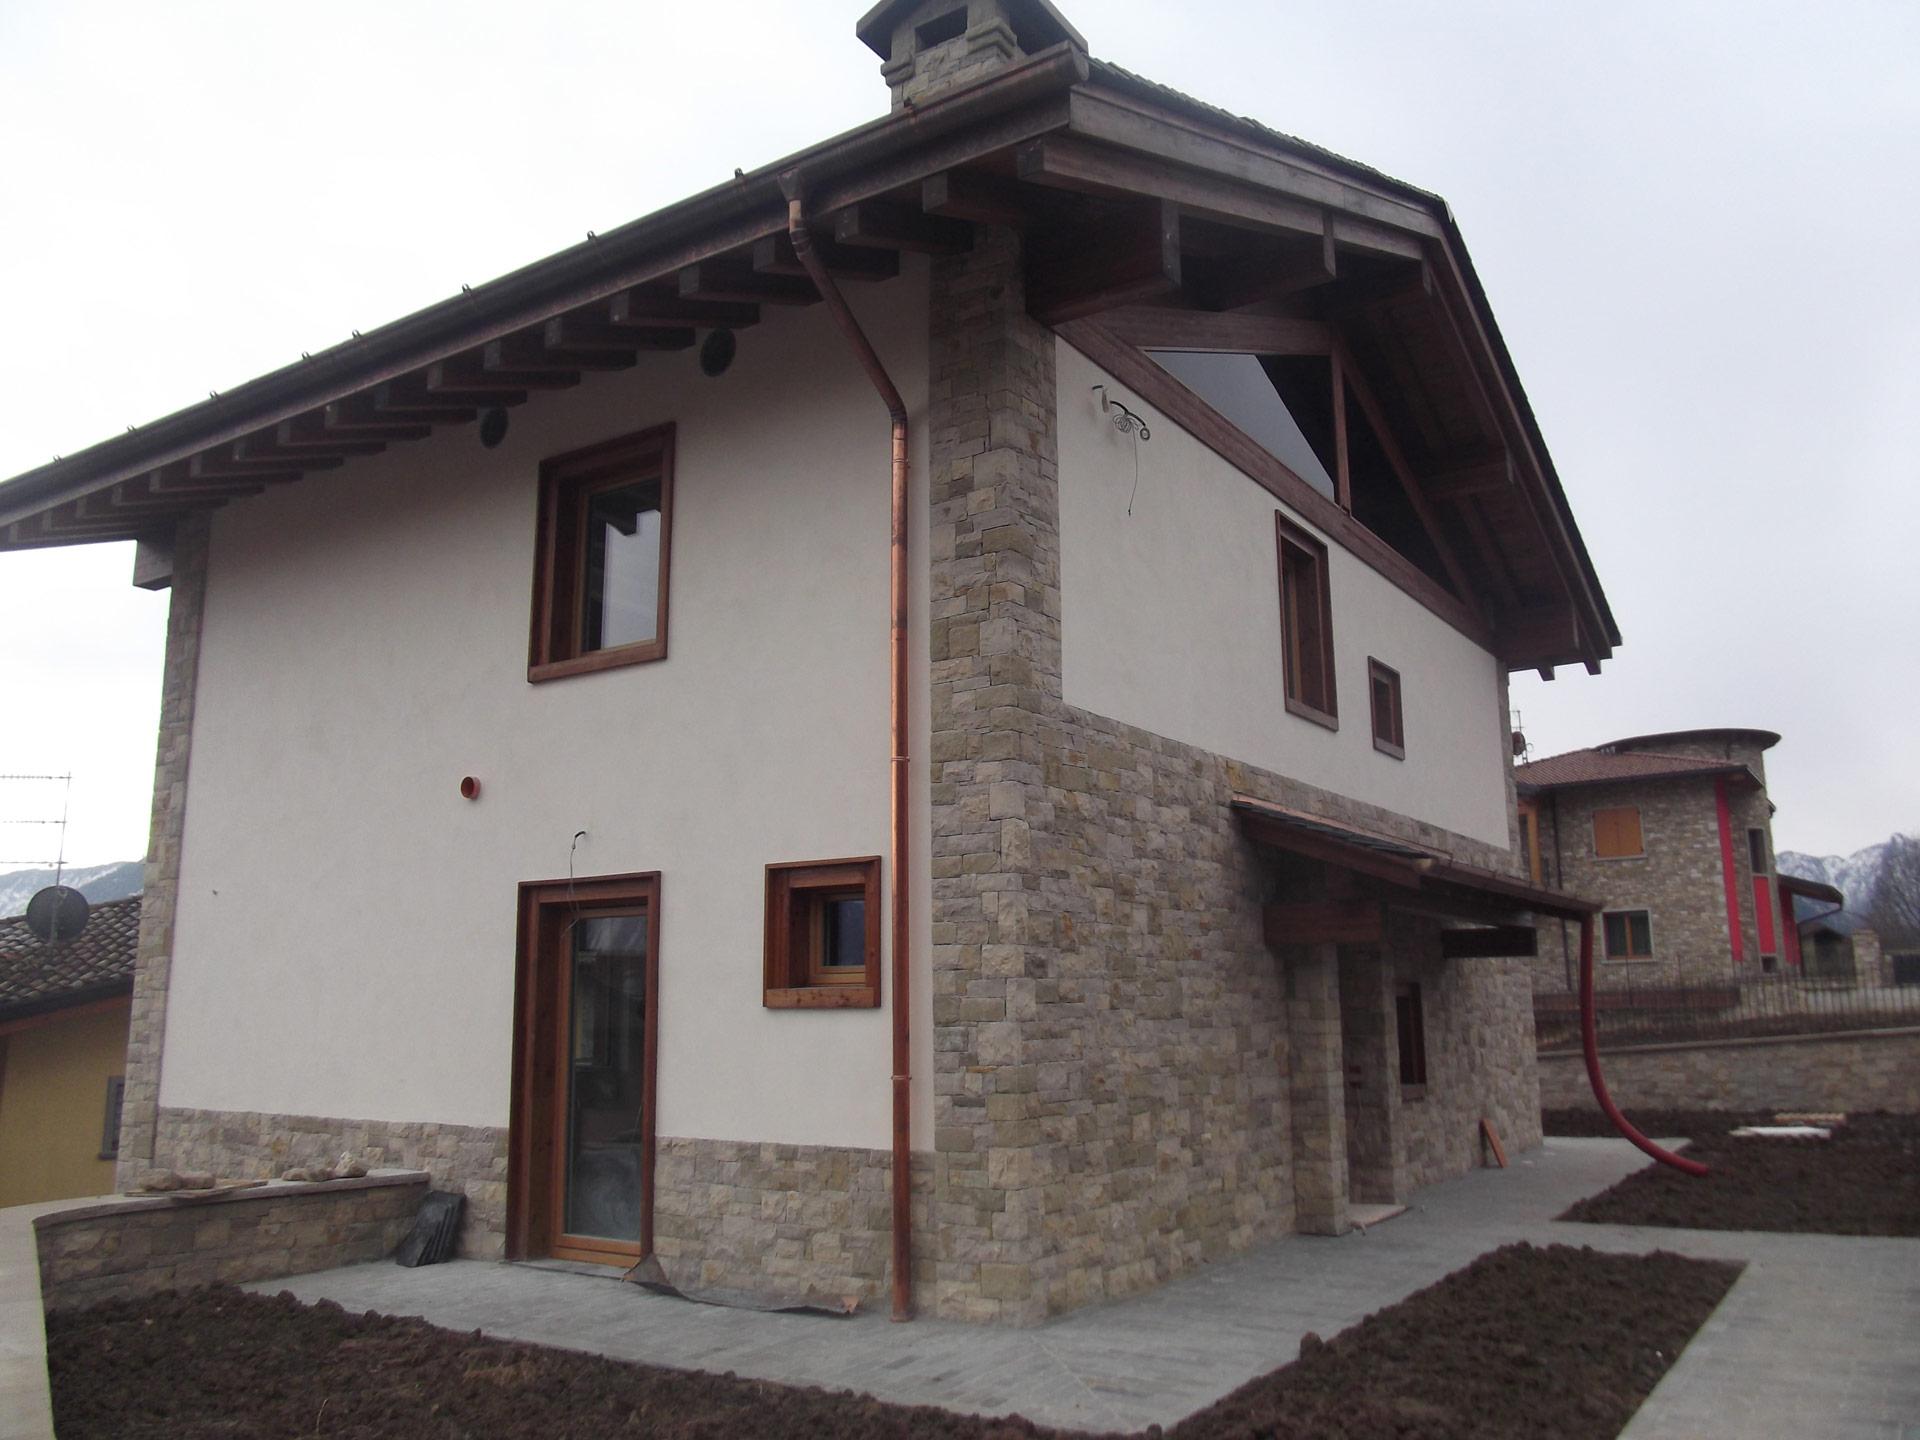 Rivestimenti in pietra umidit di risalita for Immagini facciate case